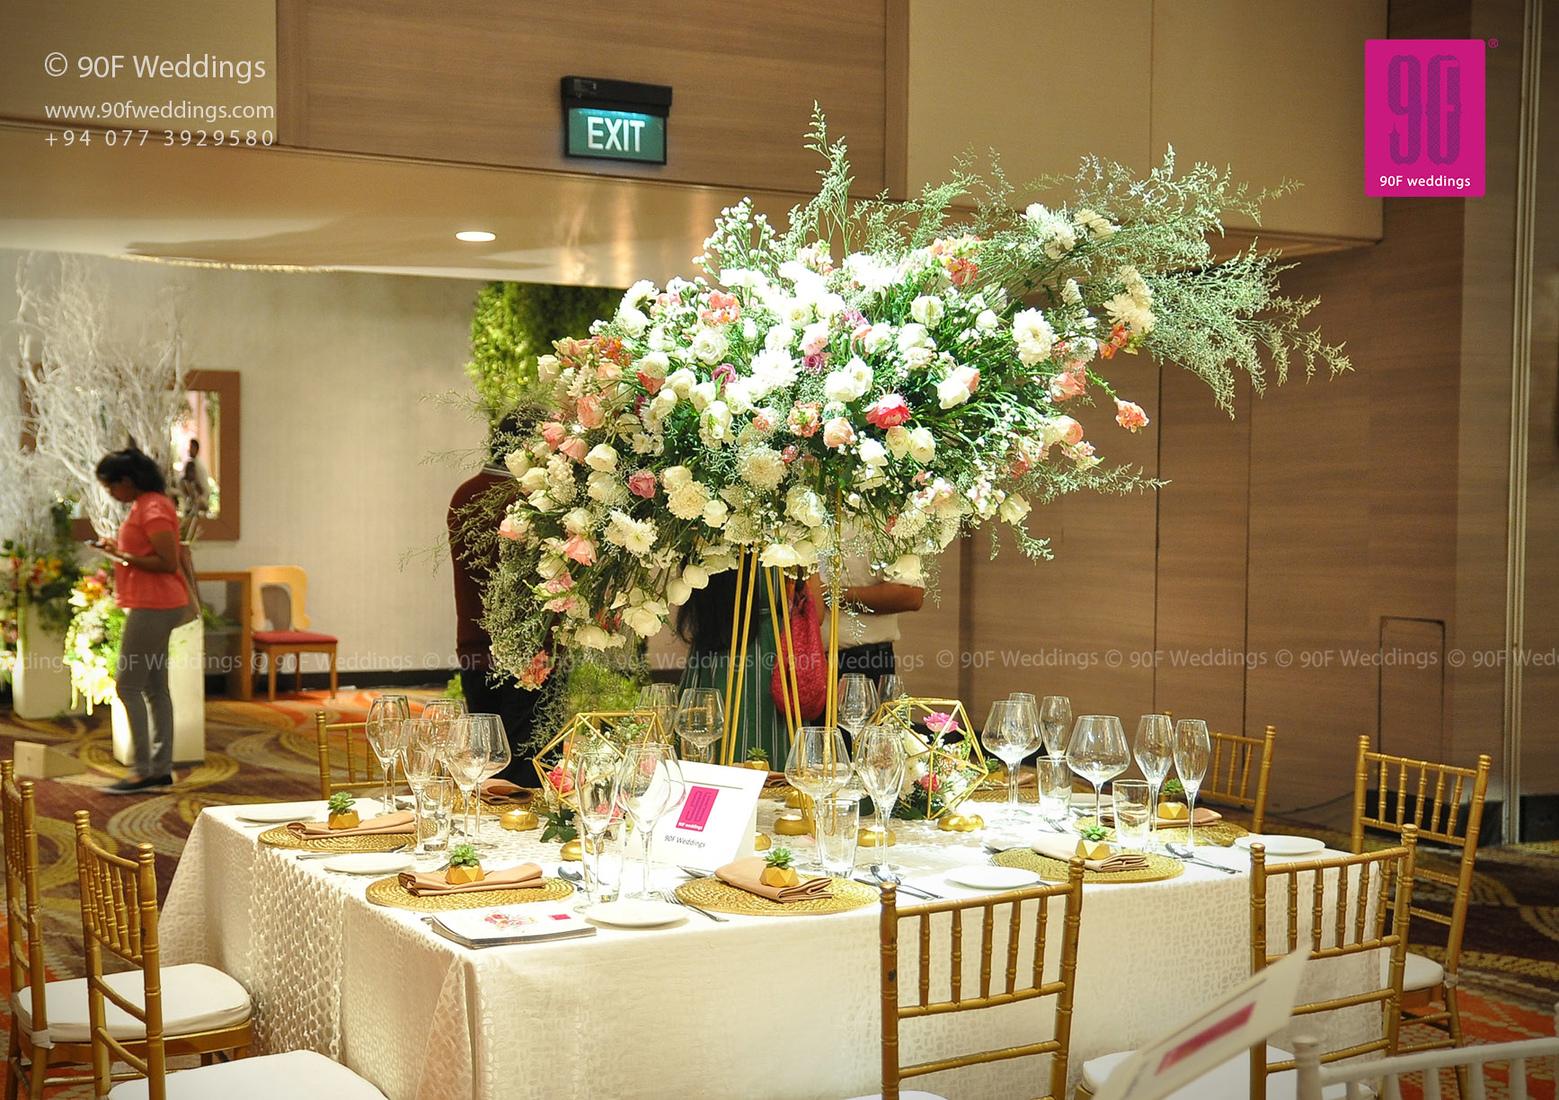 90f Weddings